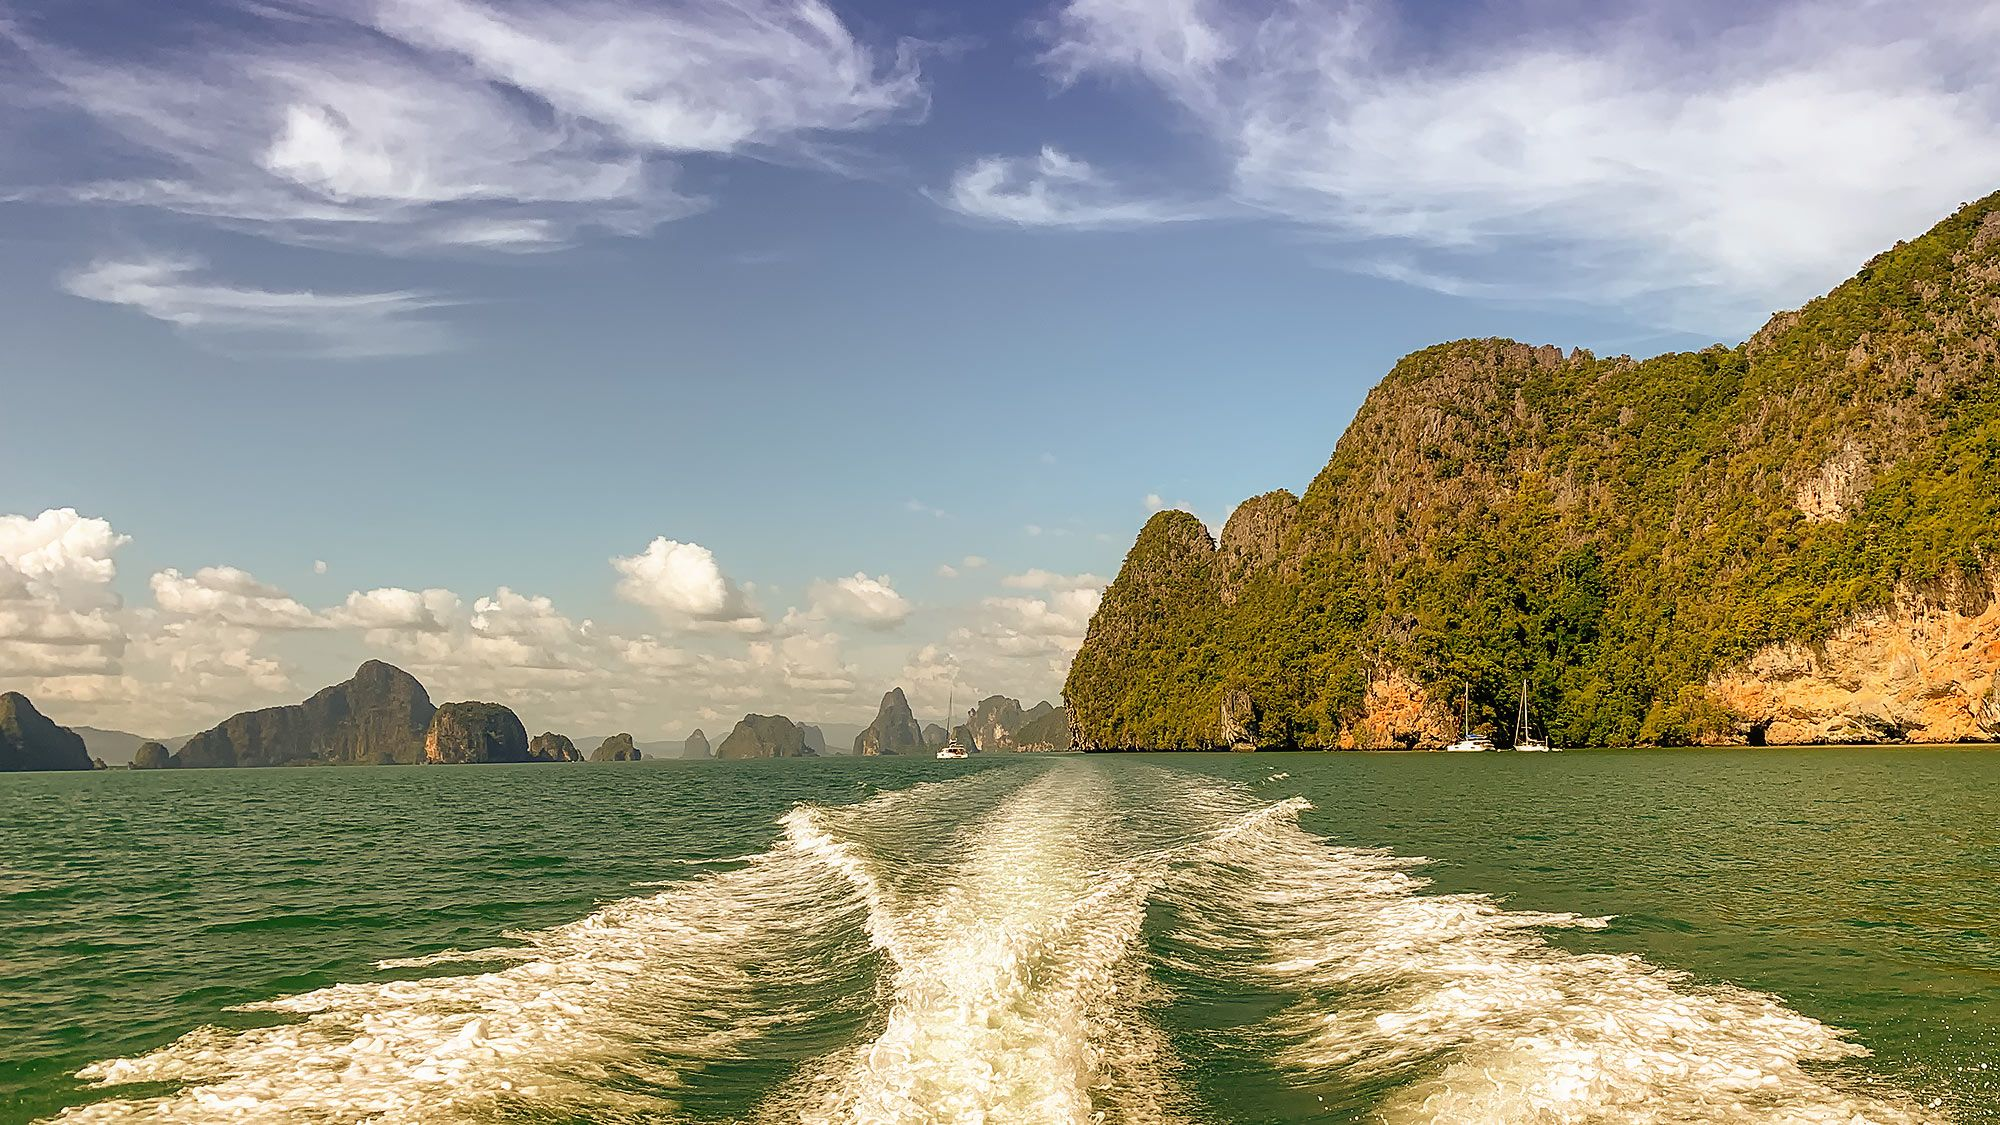 leaving James Bond Island